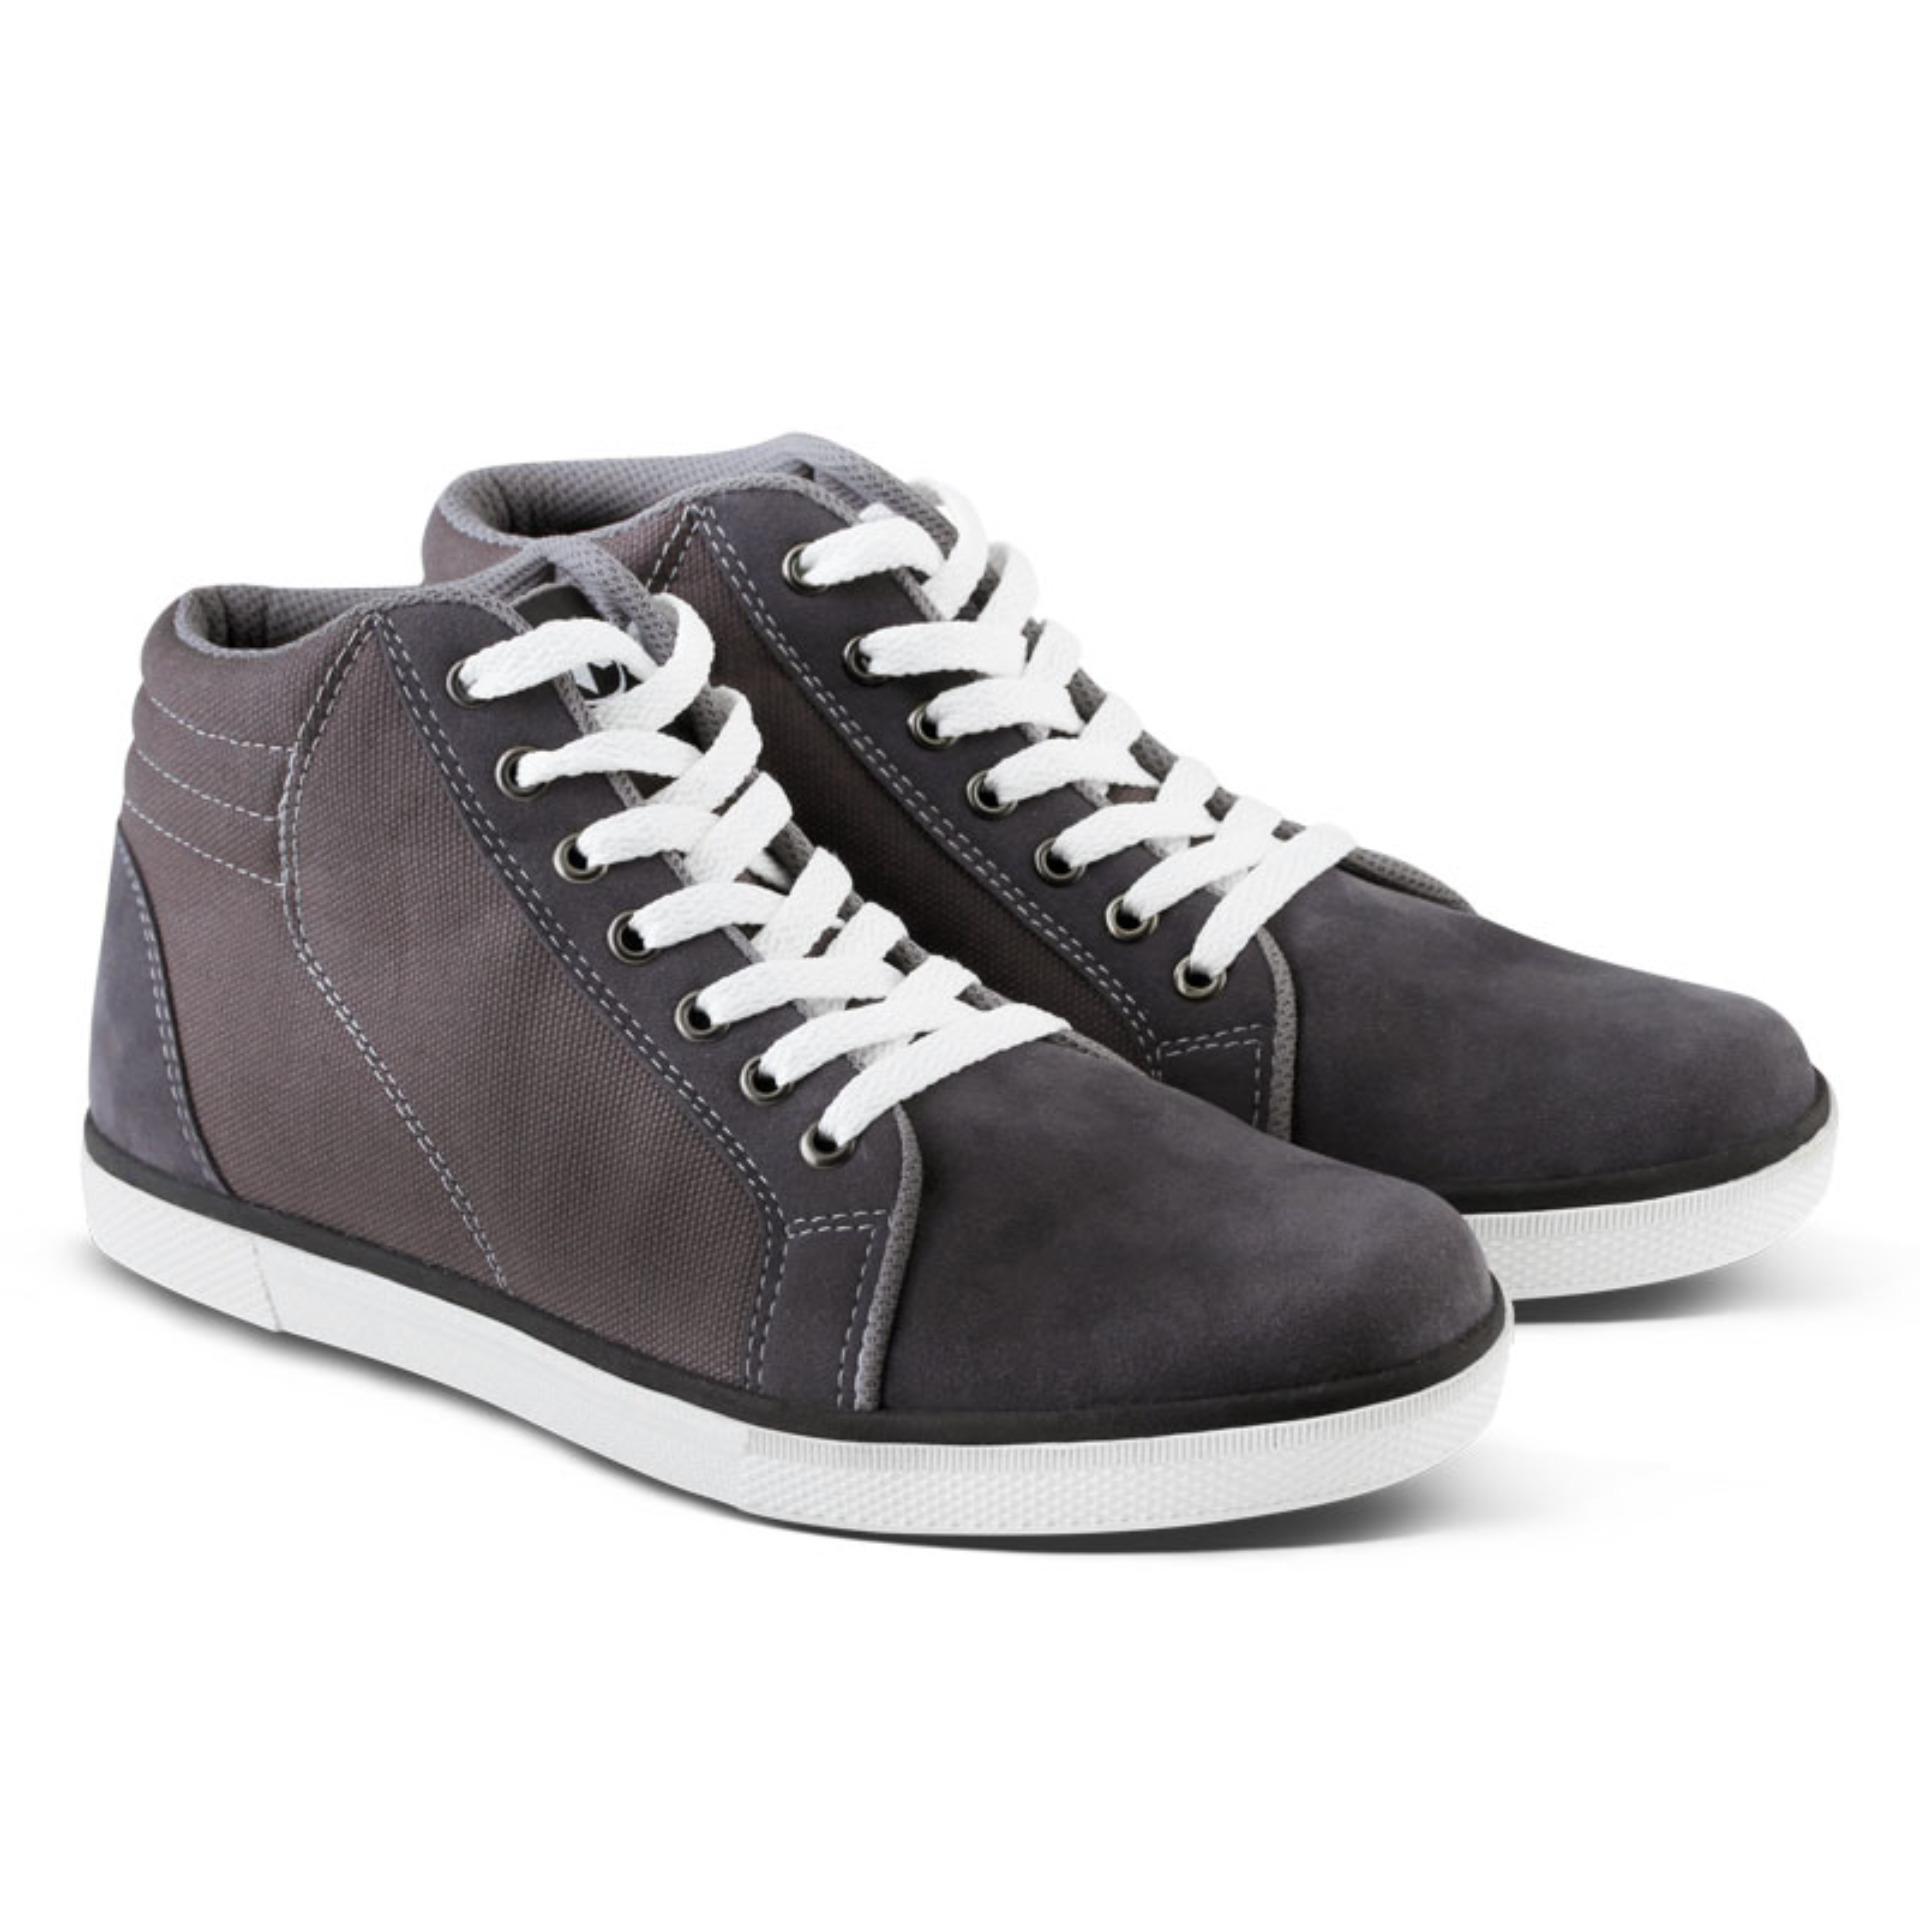 Distro Bandung VR 108 Sepatu Boot Sneakers Casual Pria - Abu